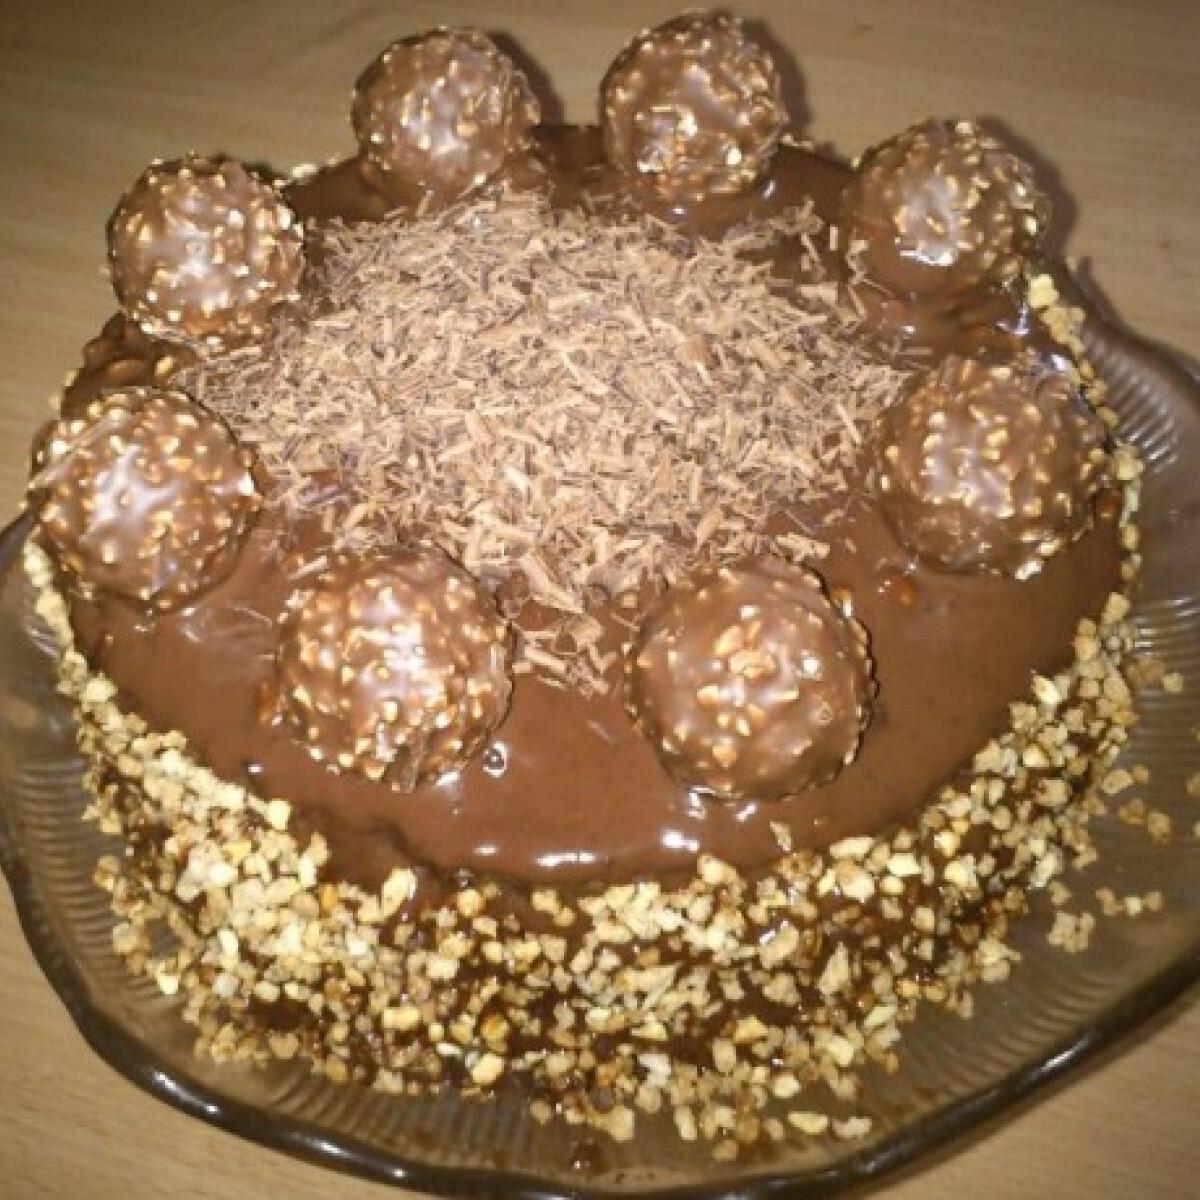 Ezen a képen: Ferrero torta